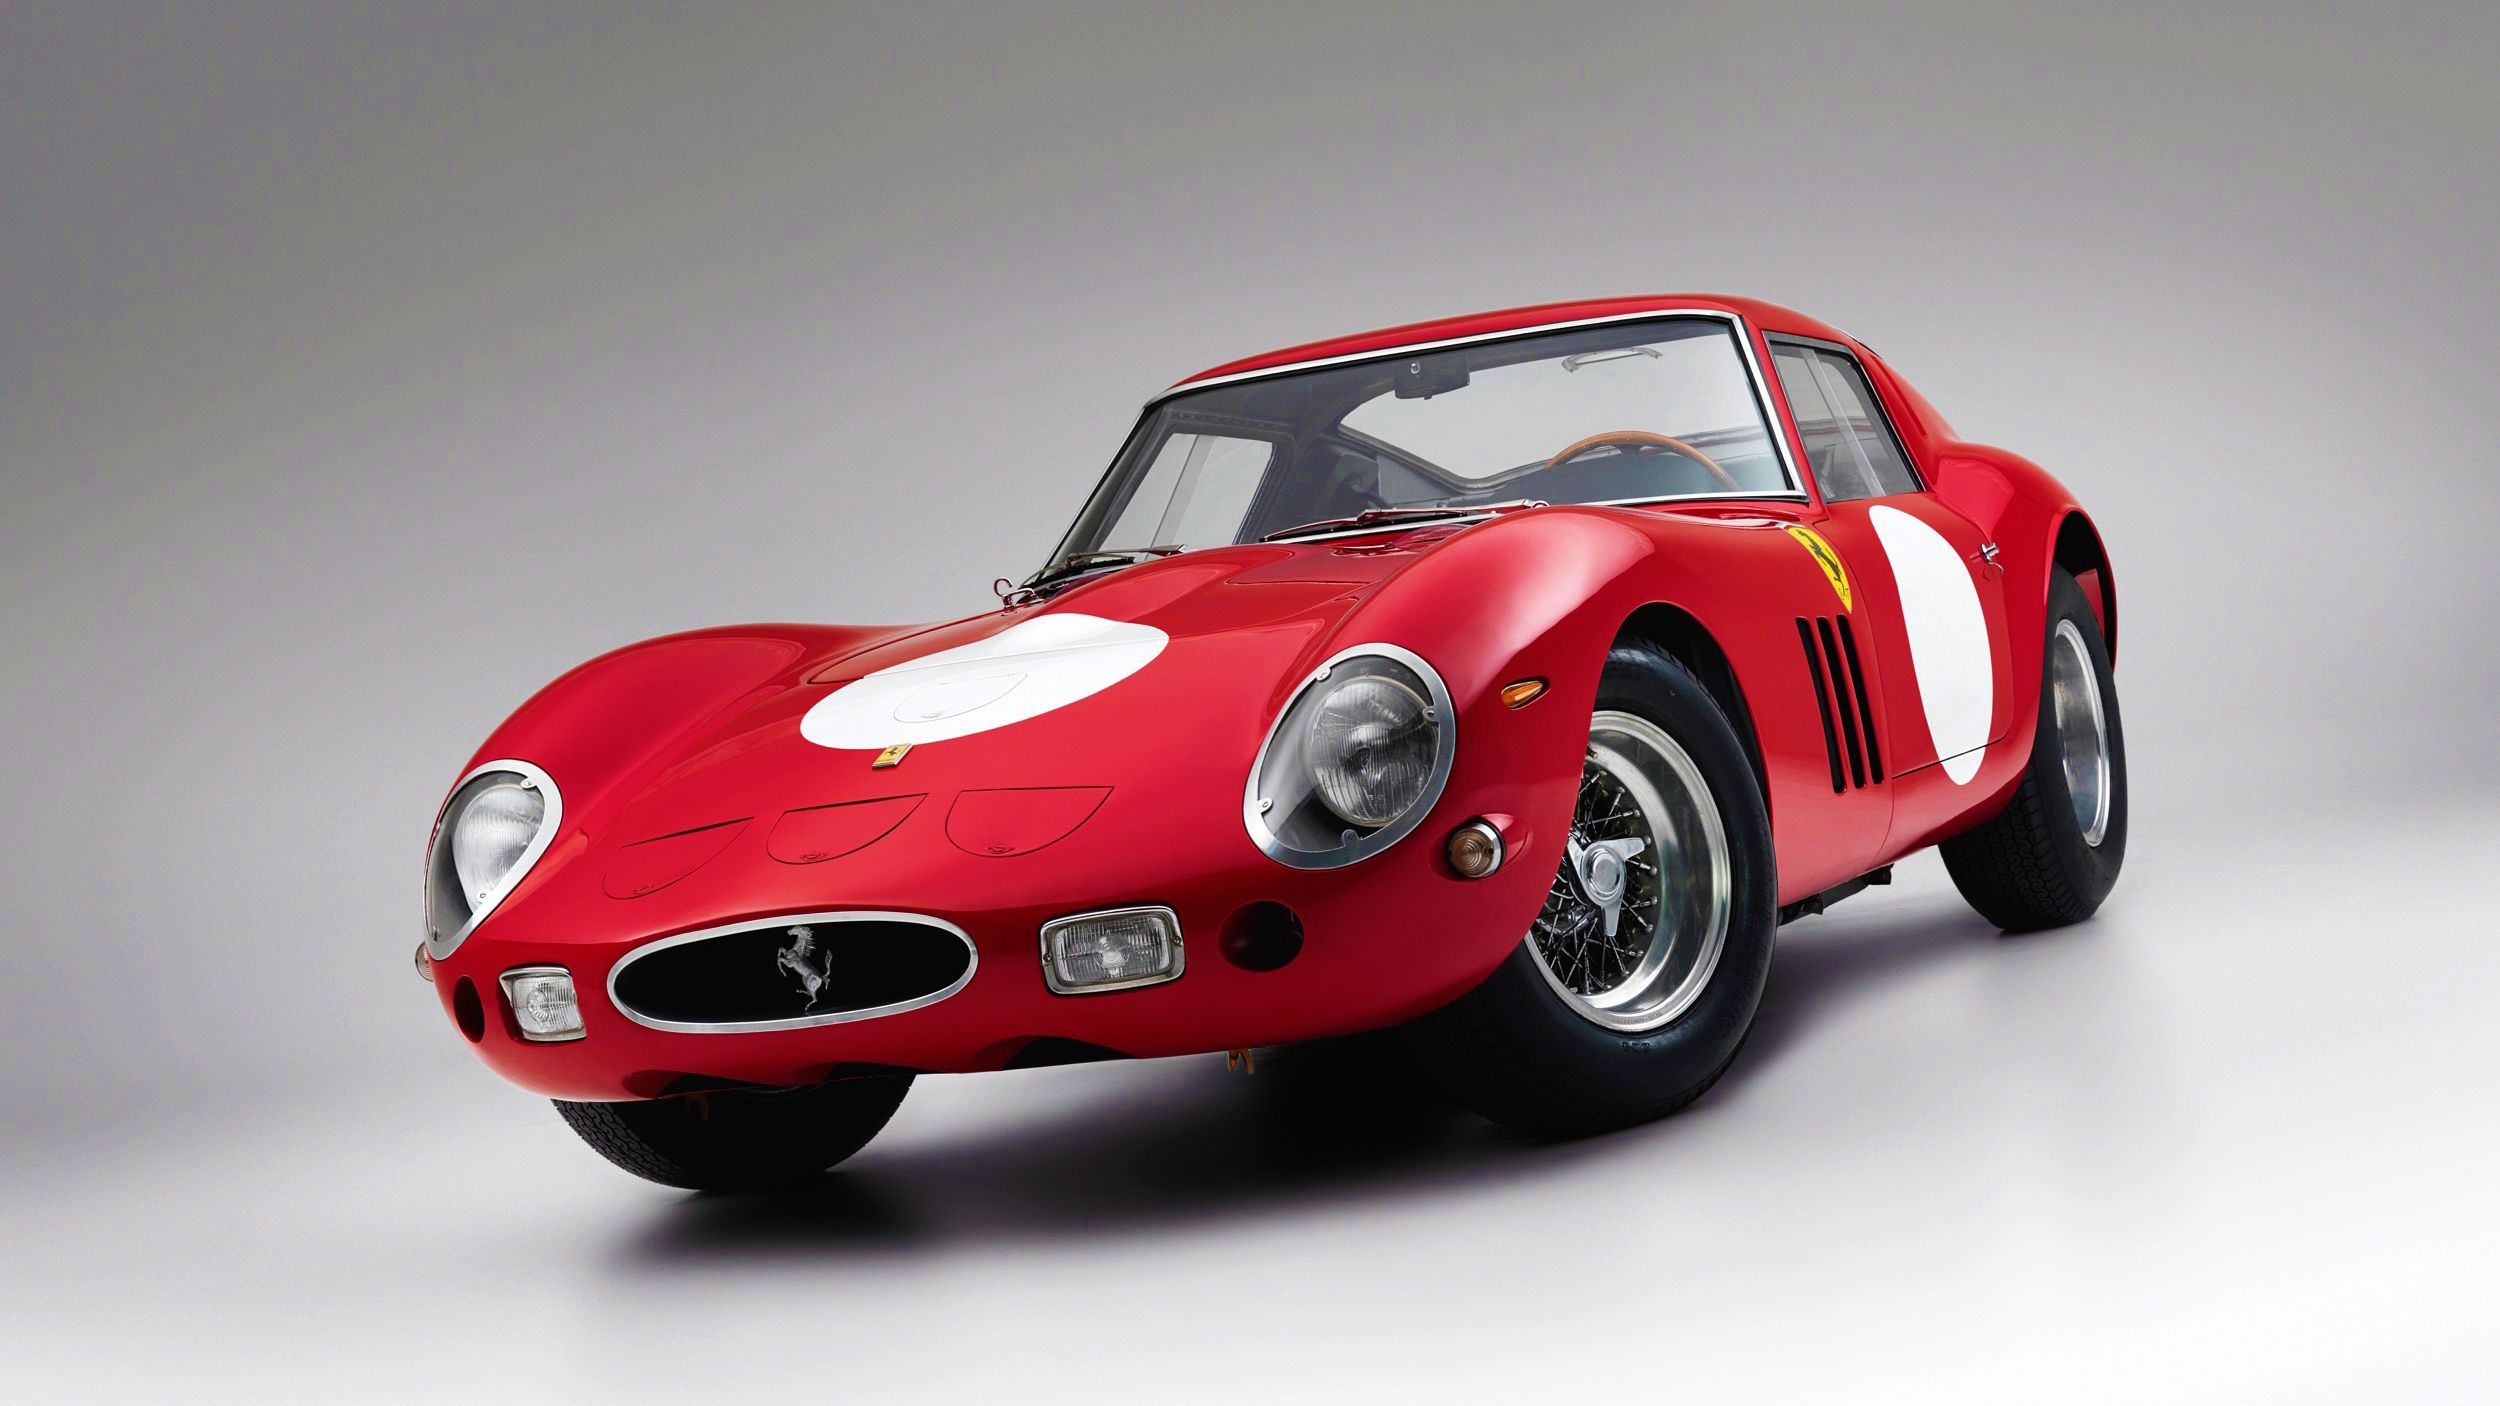 Ferrari 250 Gto Conversion By Hoyle Jolley 1963 Ferrari